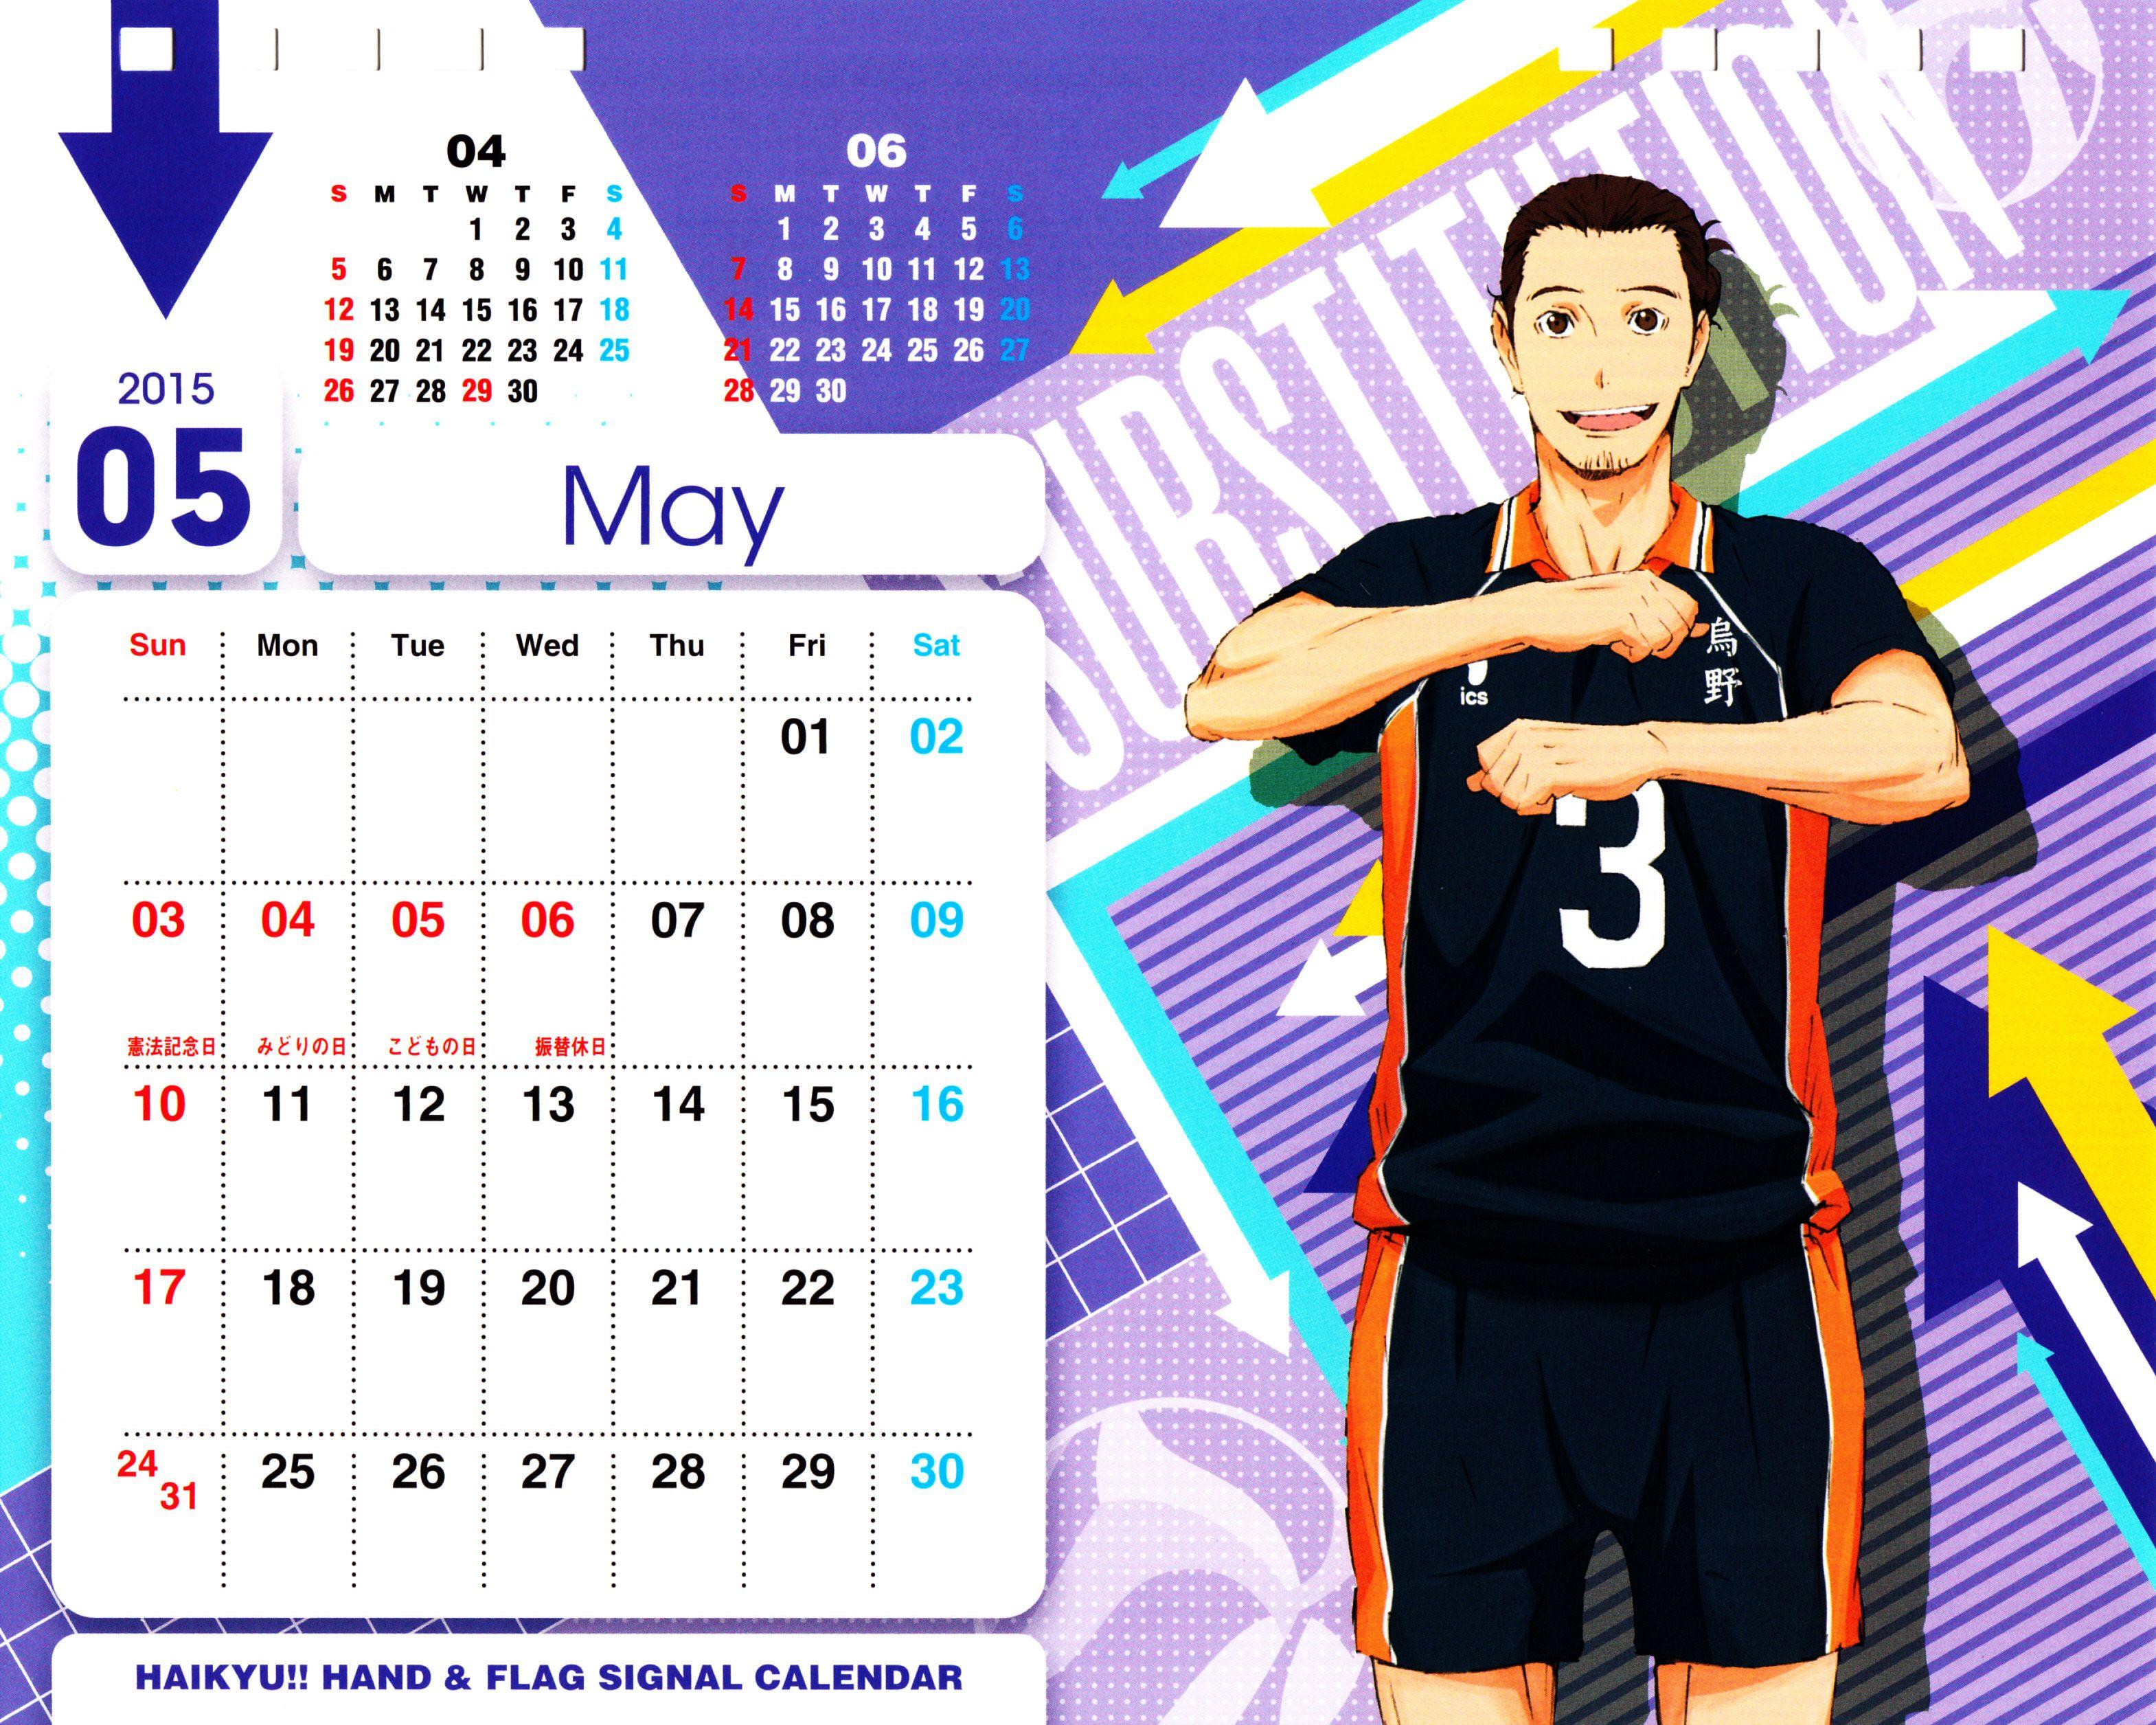 Haruichi Furudate, Production I.G, Haikyuu!!, Haikyuu!! Calendar 2015, Asahi Azumane